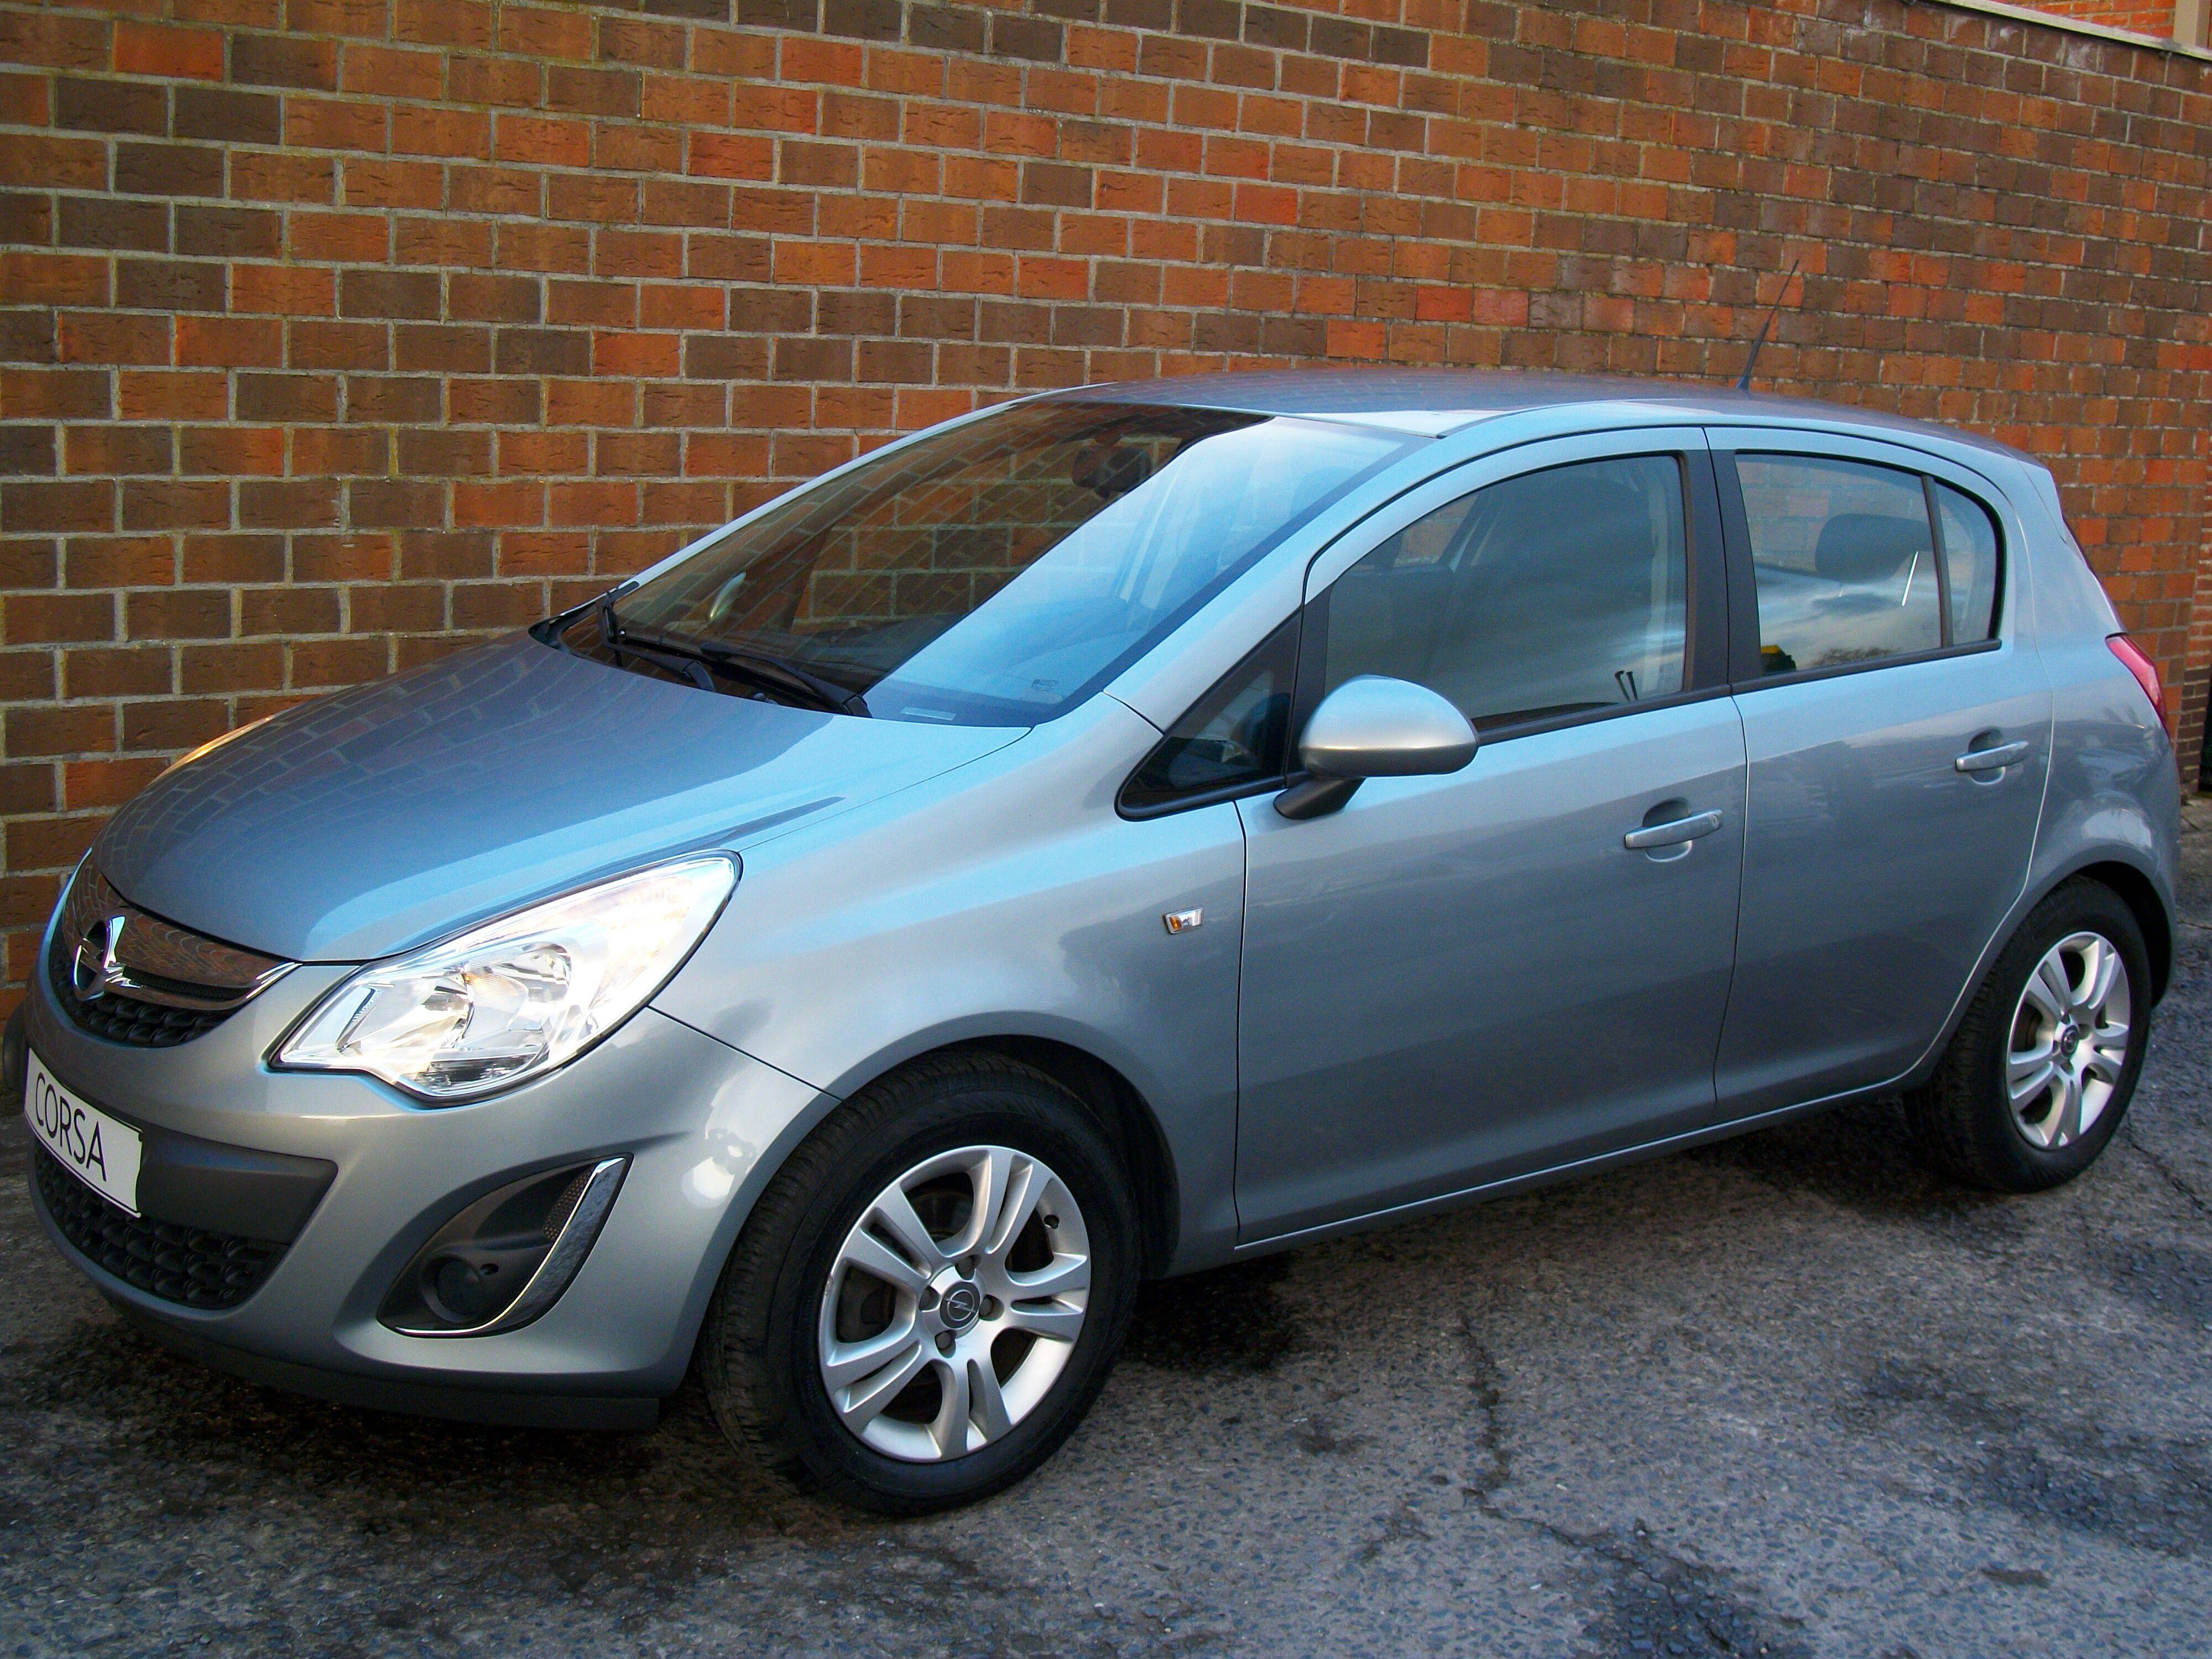 Opel CORSA - 2011 1.2 Benz - weinig kilometers 1/11